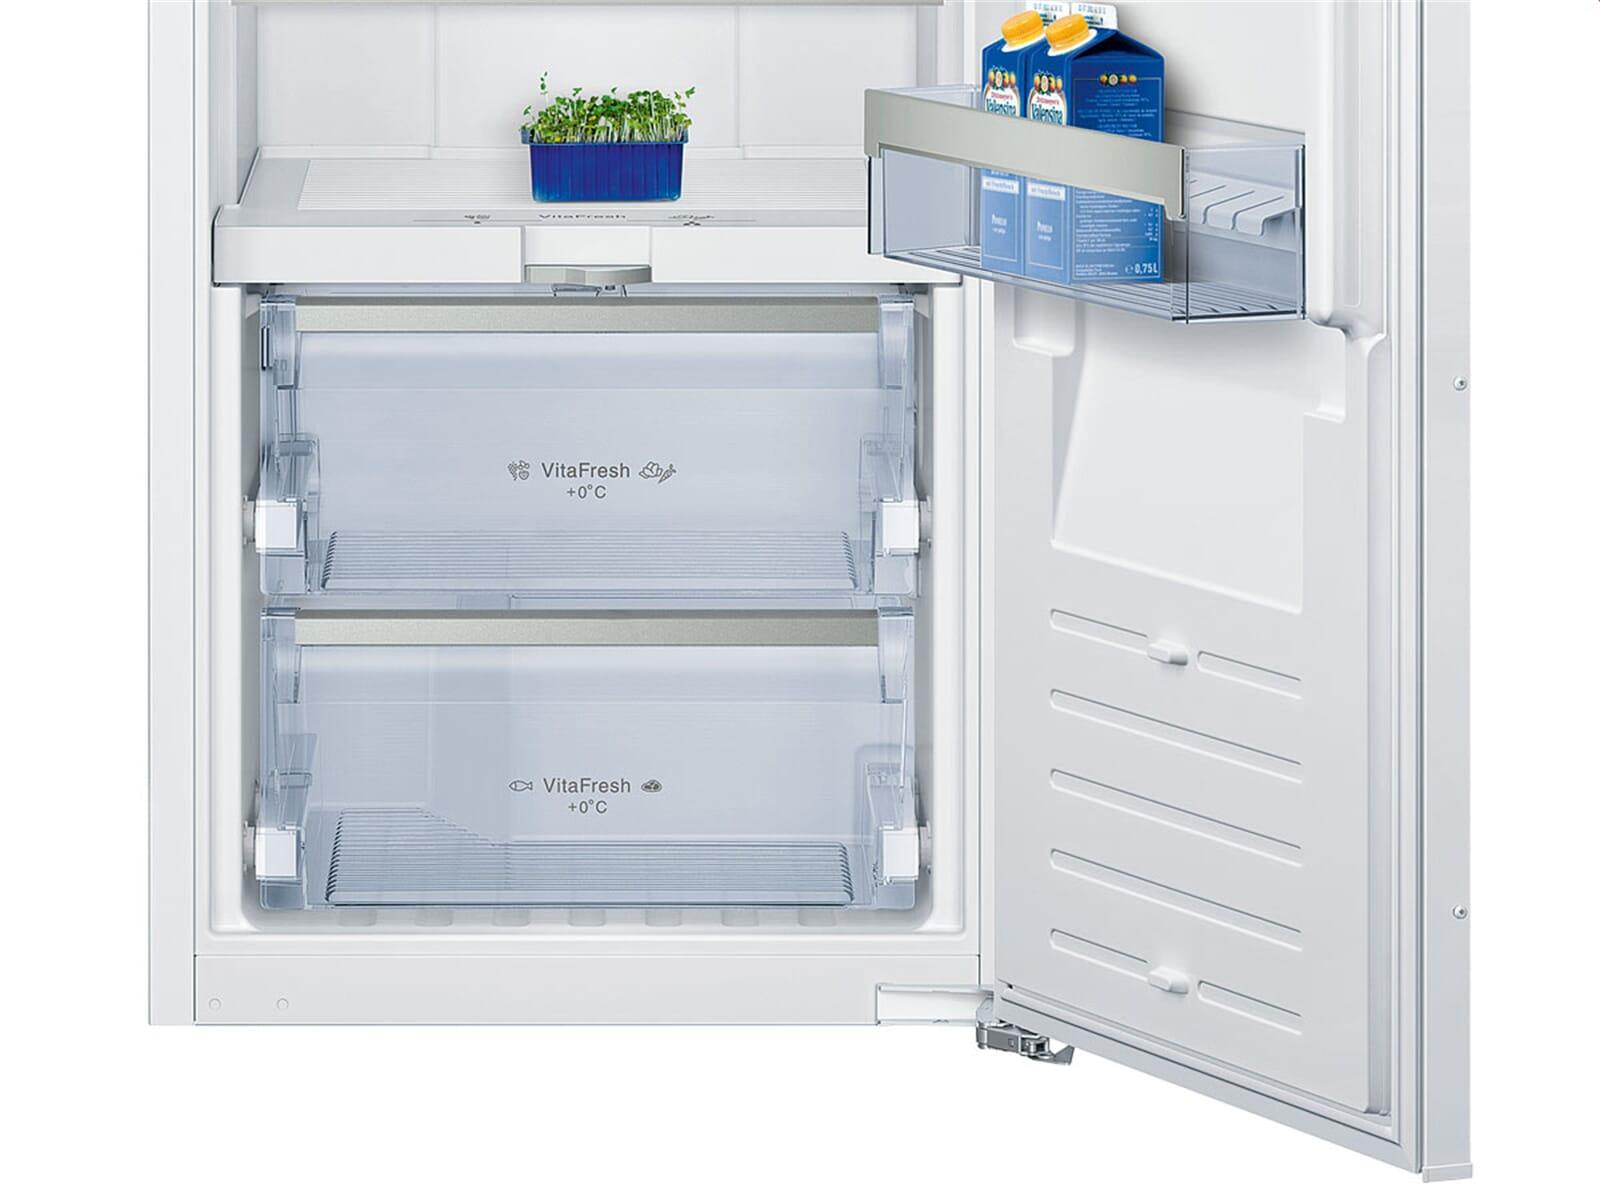 Kühlschrank Neff : Neff kn a einbaukühlschrank